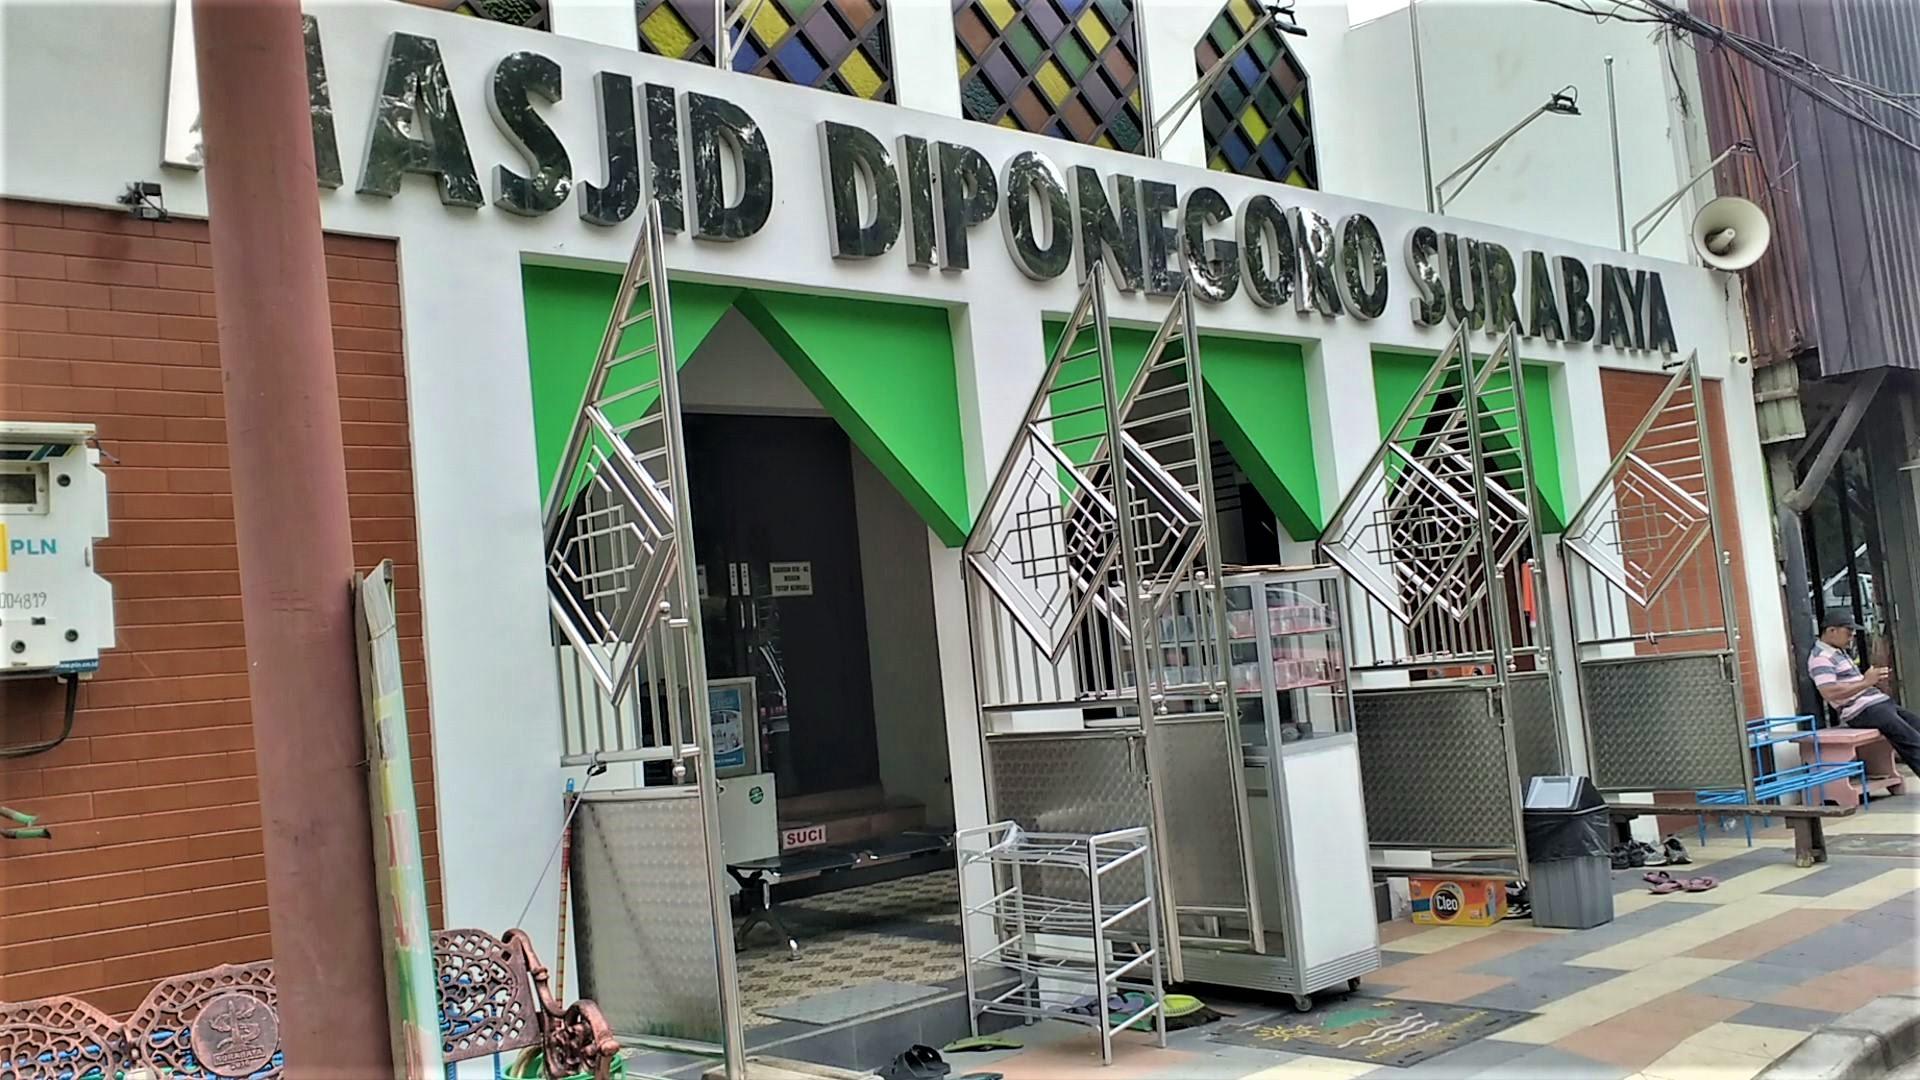 Masjid Diponegoro Surabaya. Foto: dok. pribadi